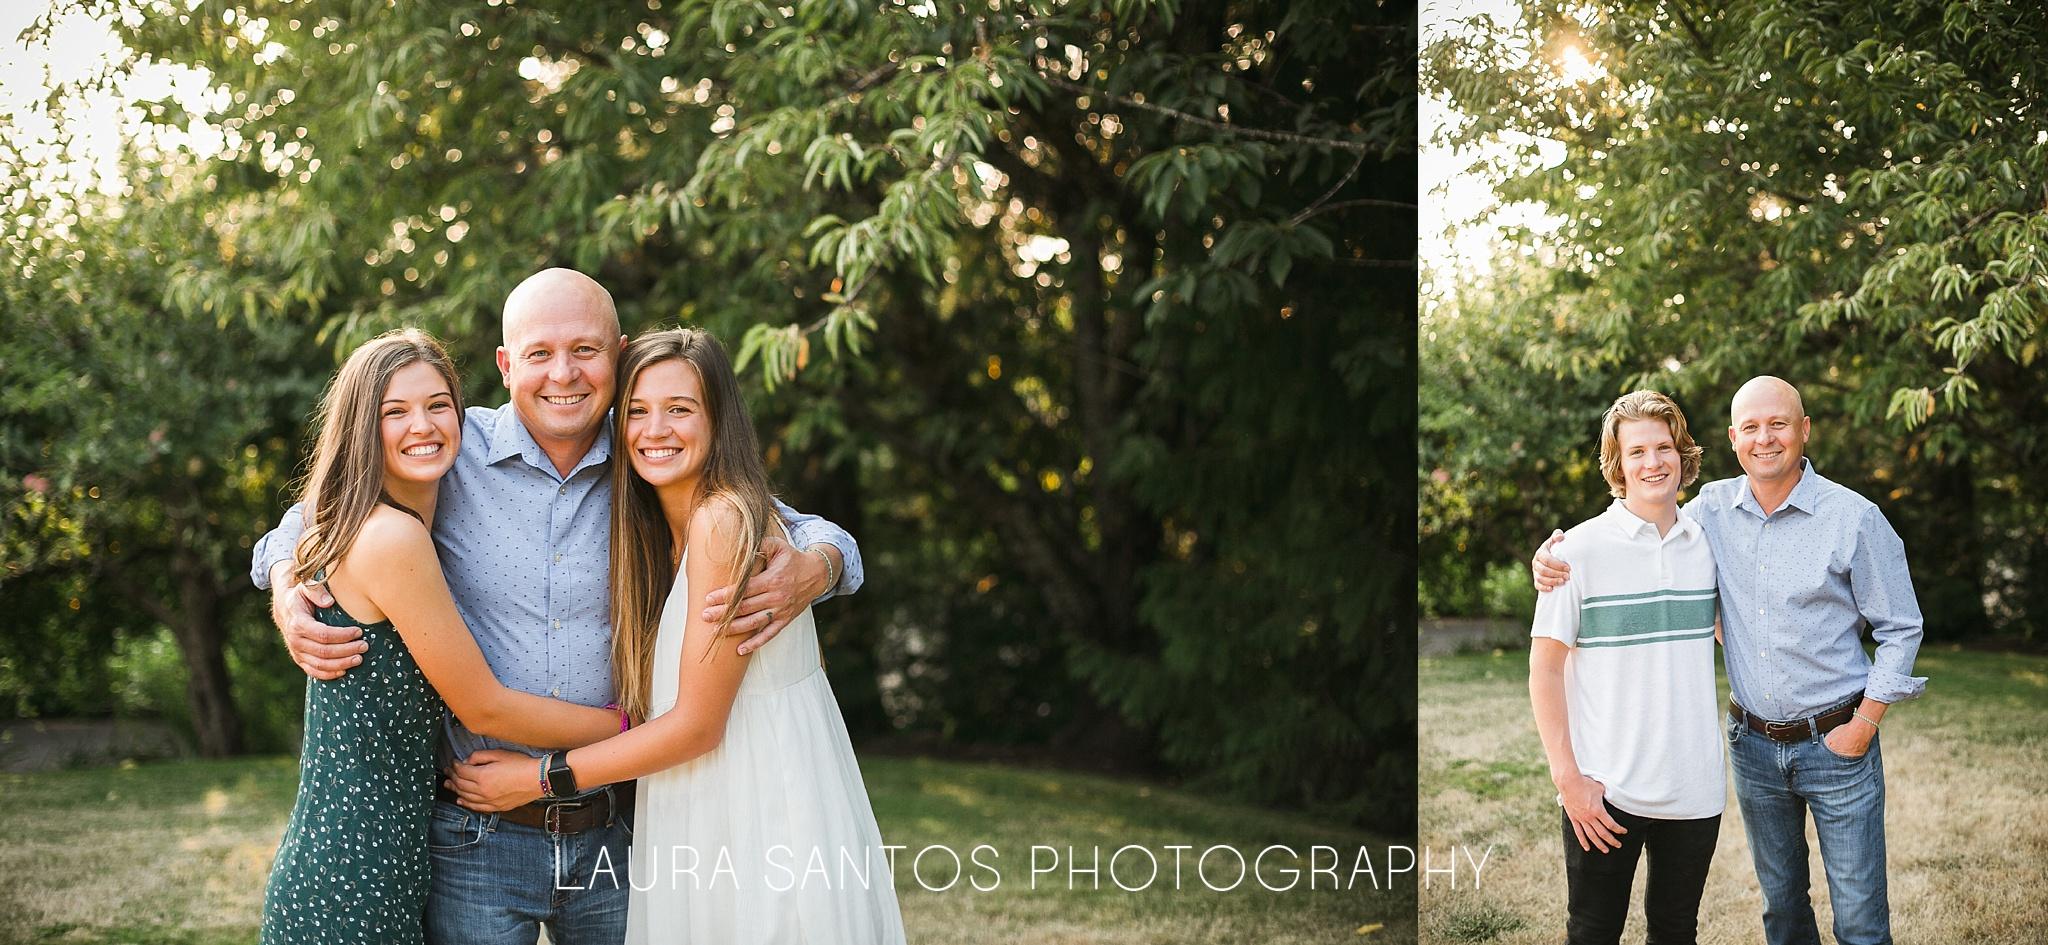 Laura Santos Photography Portland Oregon Family Photographer_0247.jpg